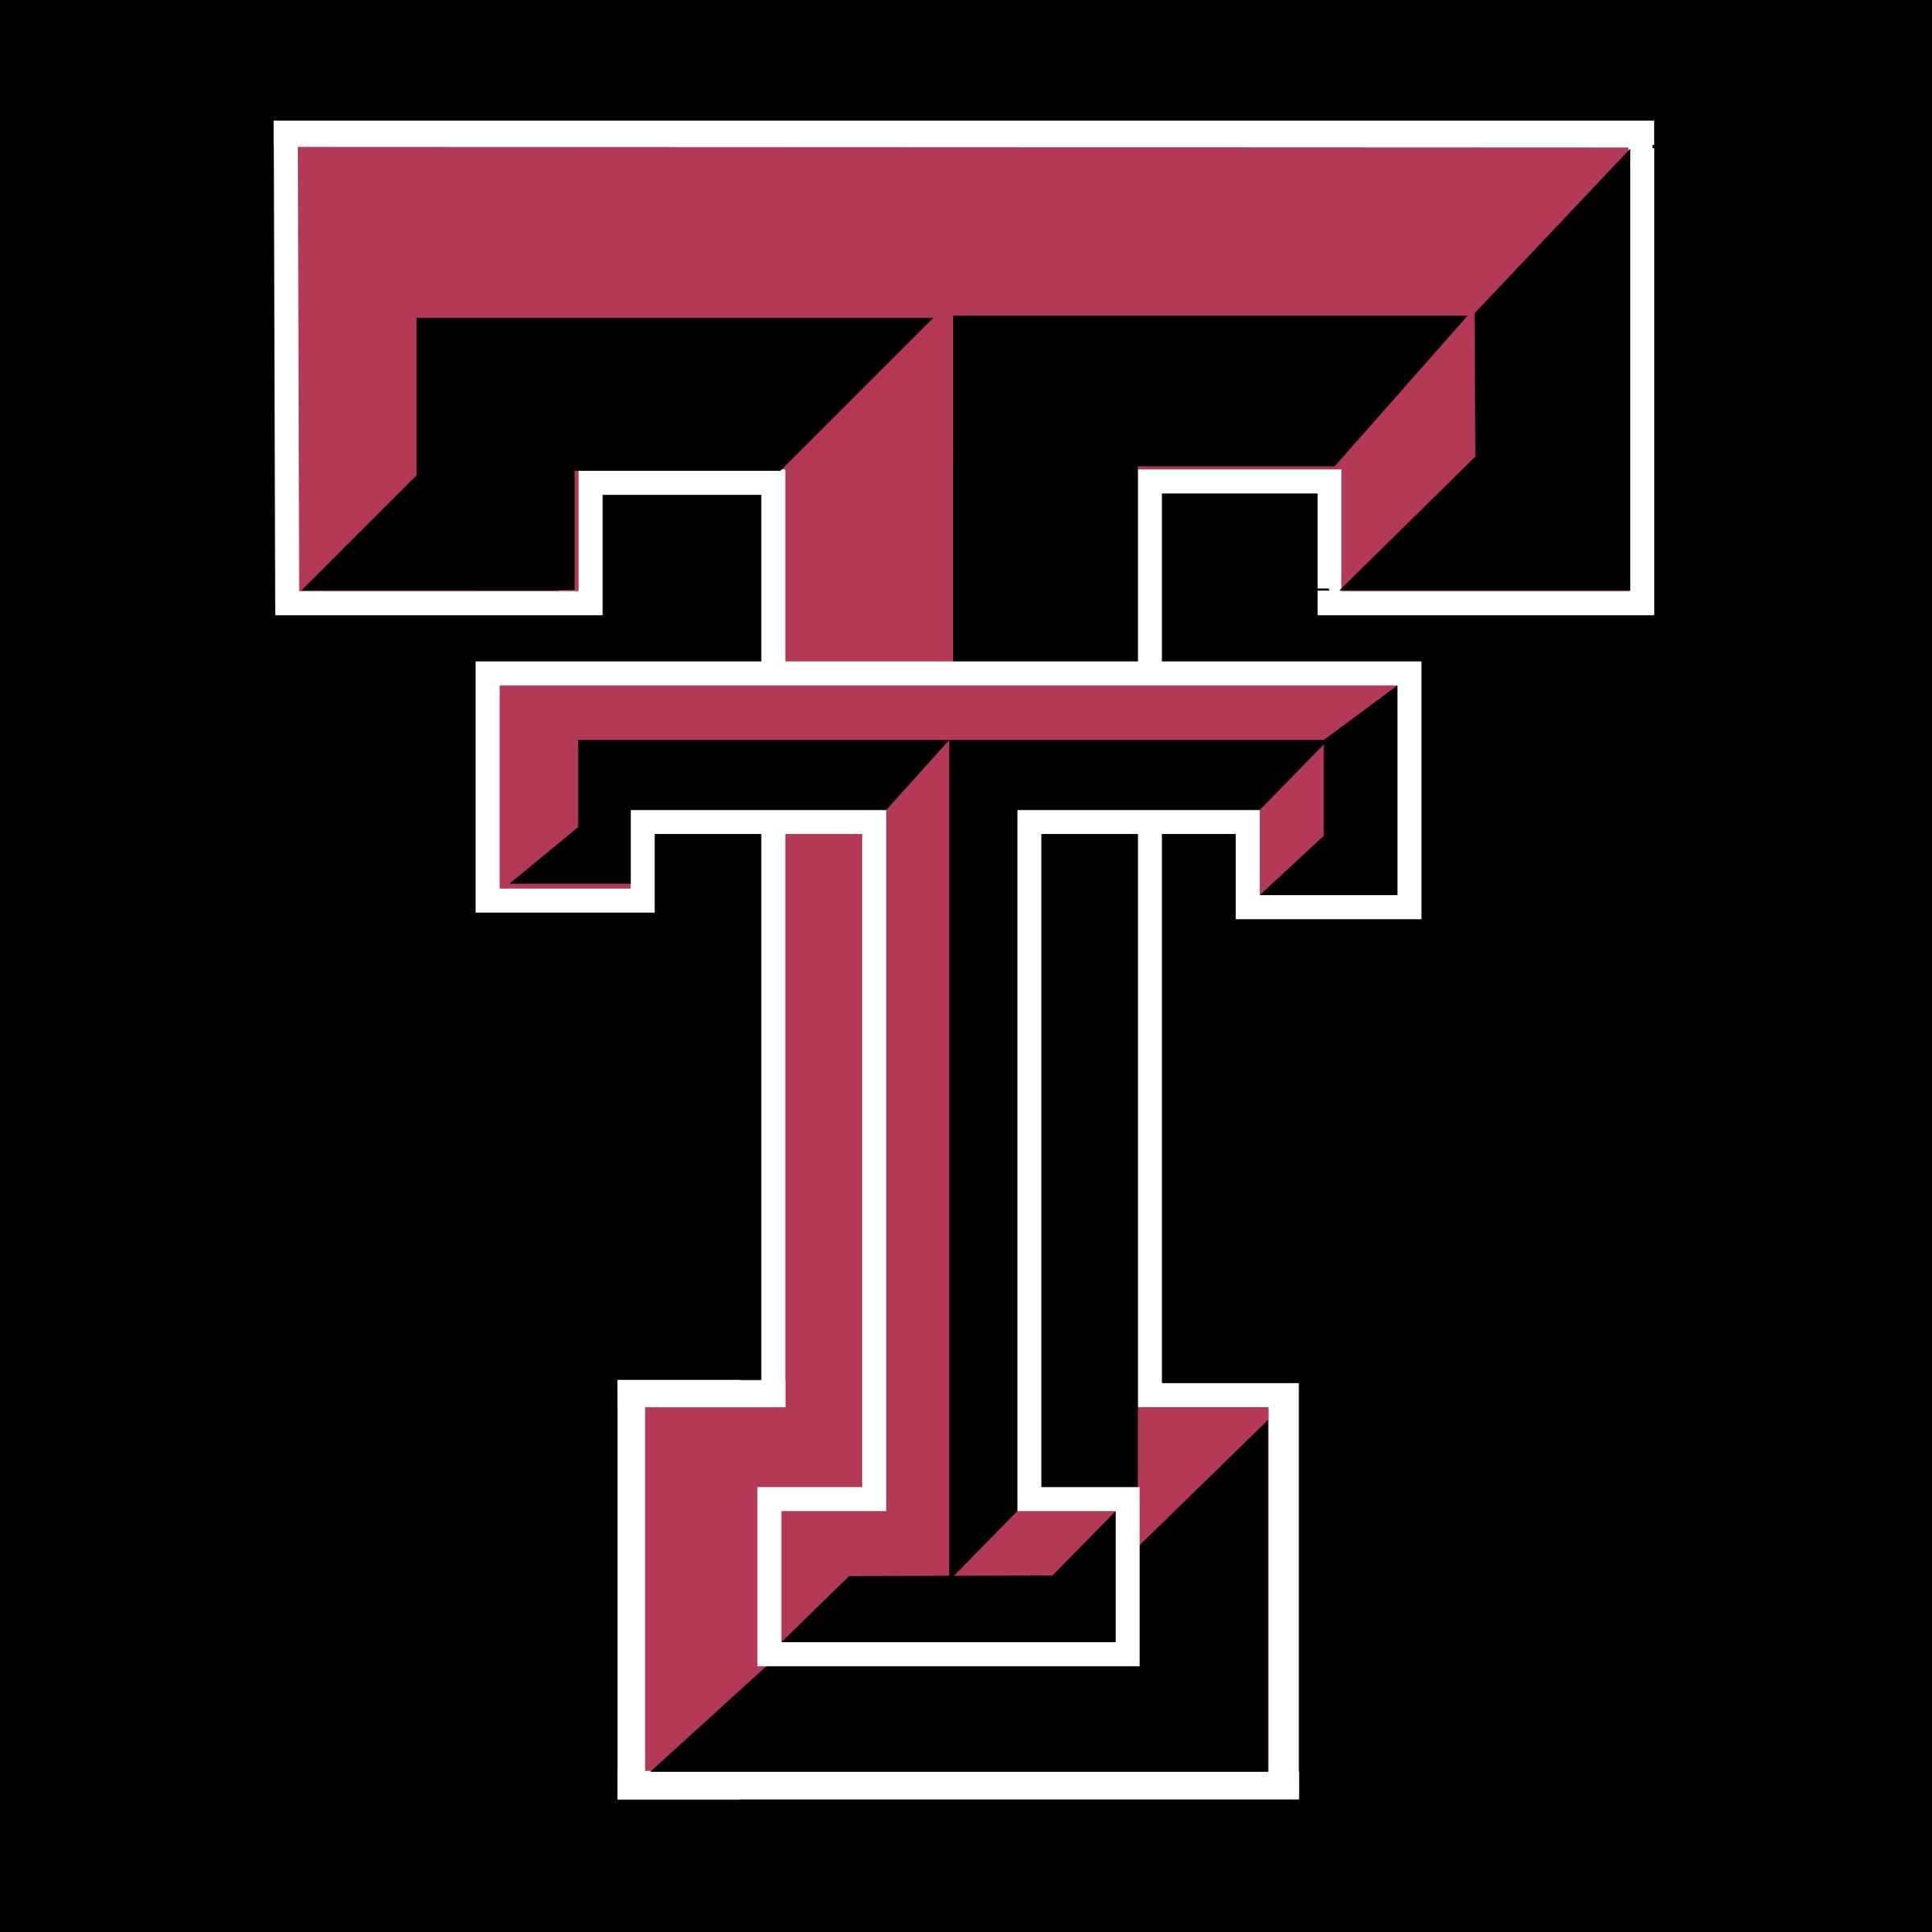 texas tech red raiders logo png transparent svg vector freebie rh freebiesupply com texas tech logo stencil texas tech logos free